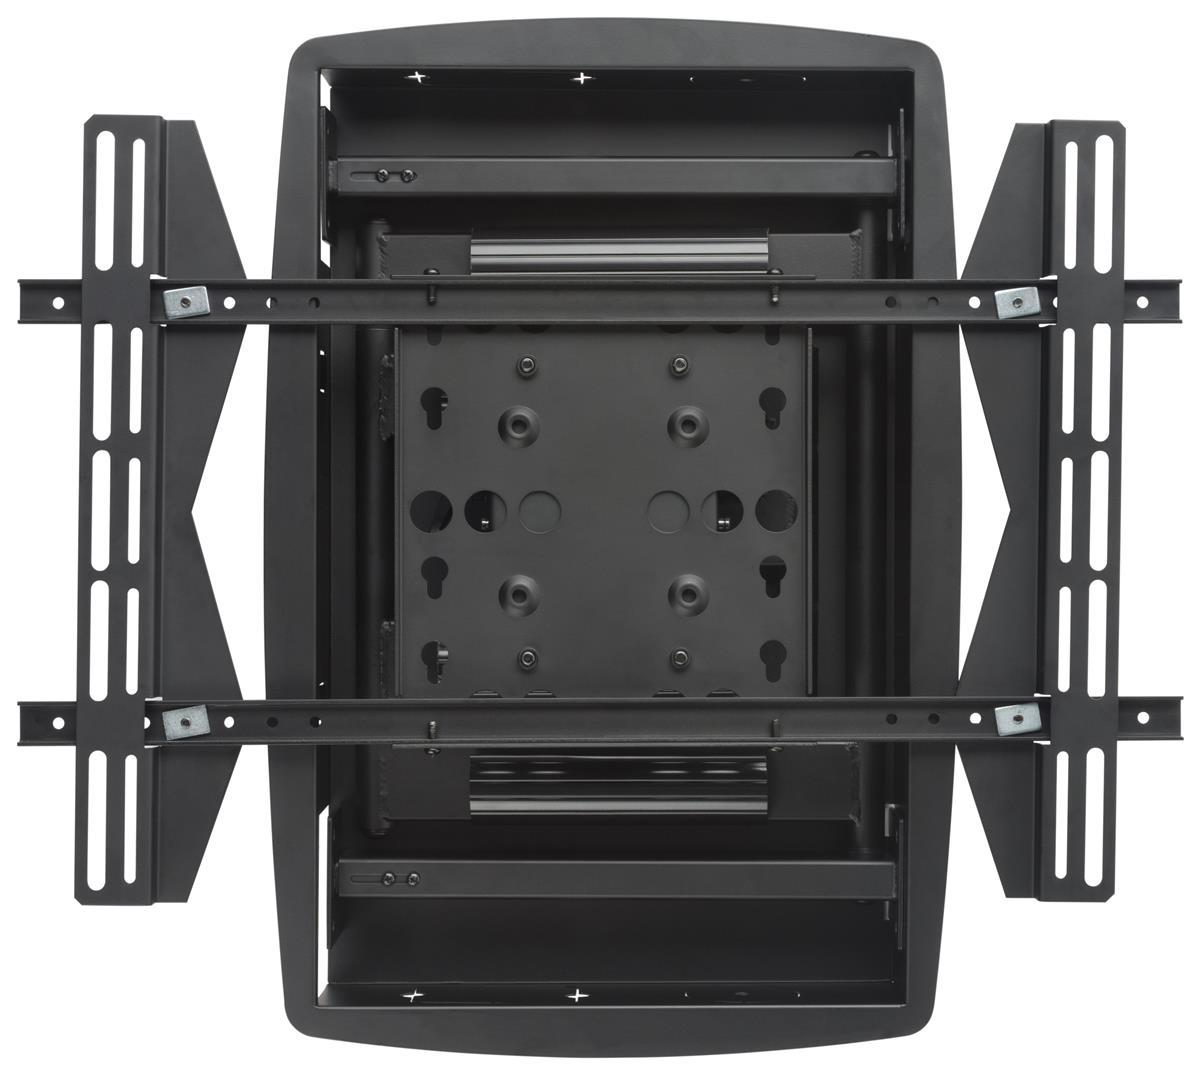 flush tv wall mount install between 16 studs. Black Bedroom Furniture Sets. Home Design Ideas